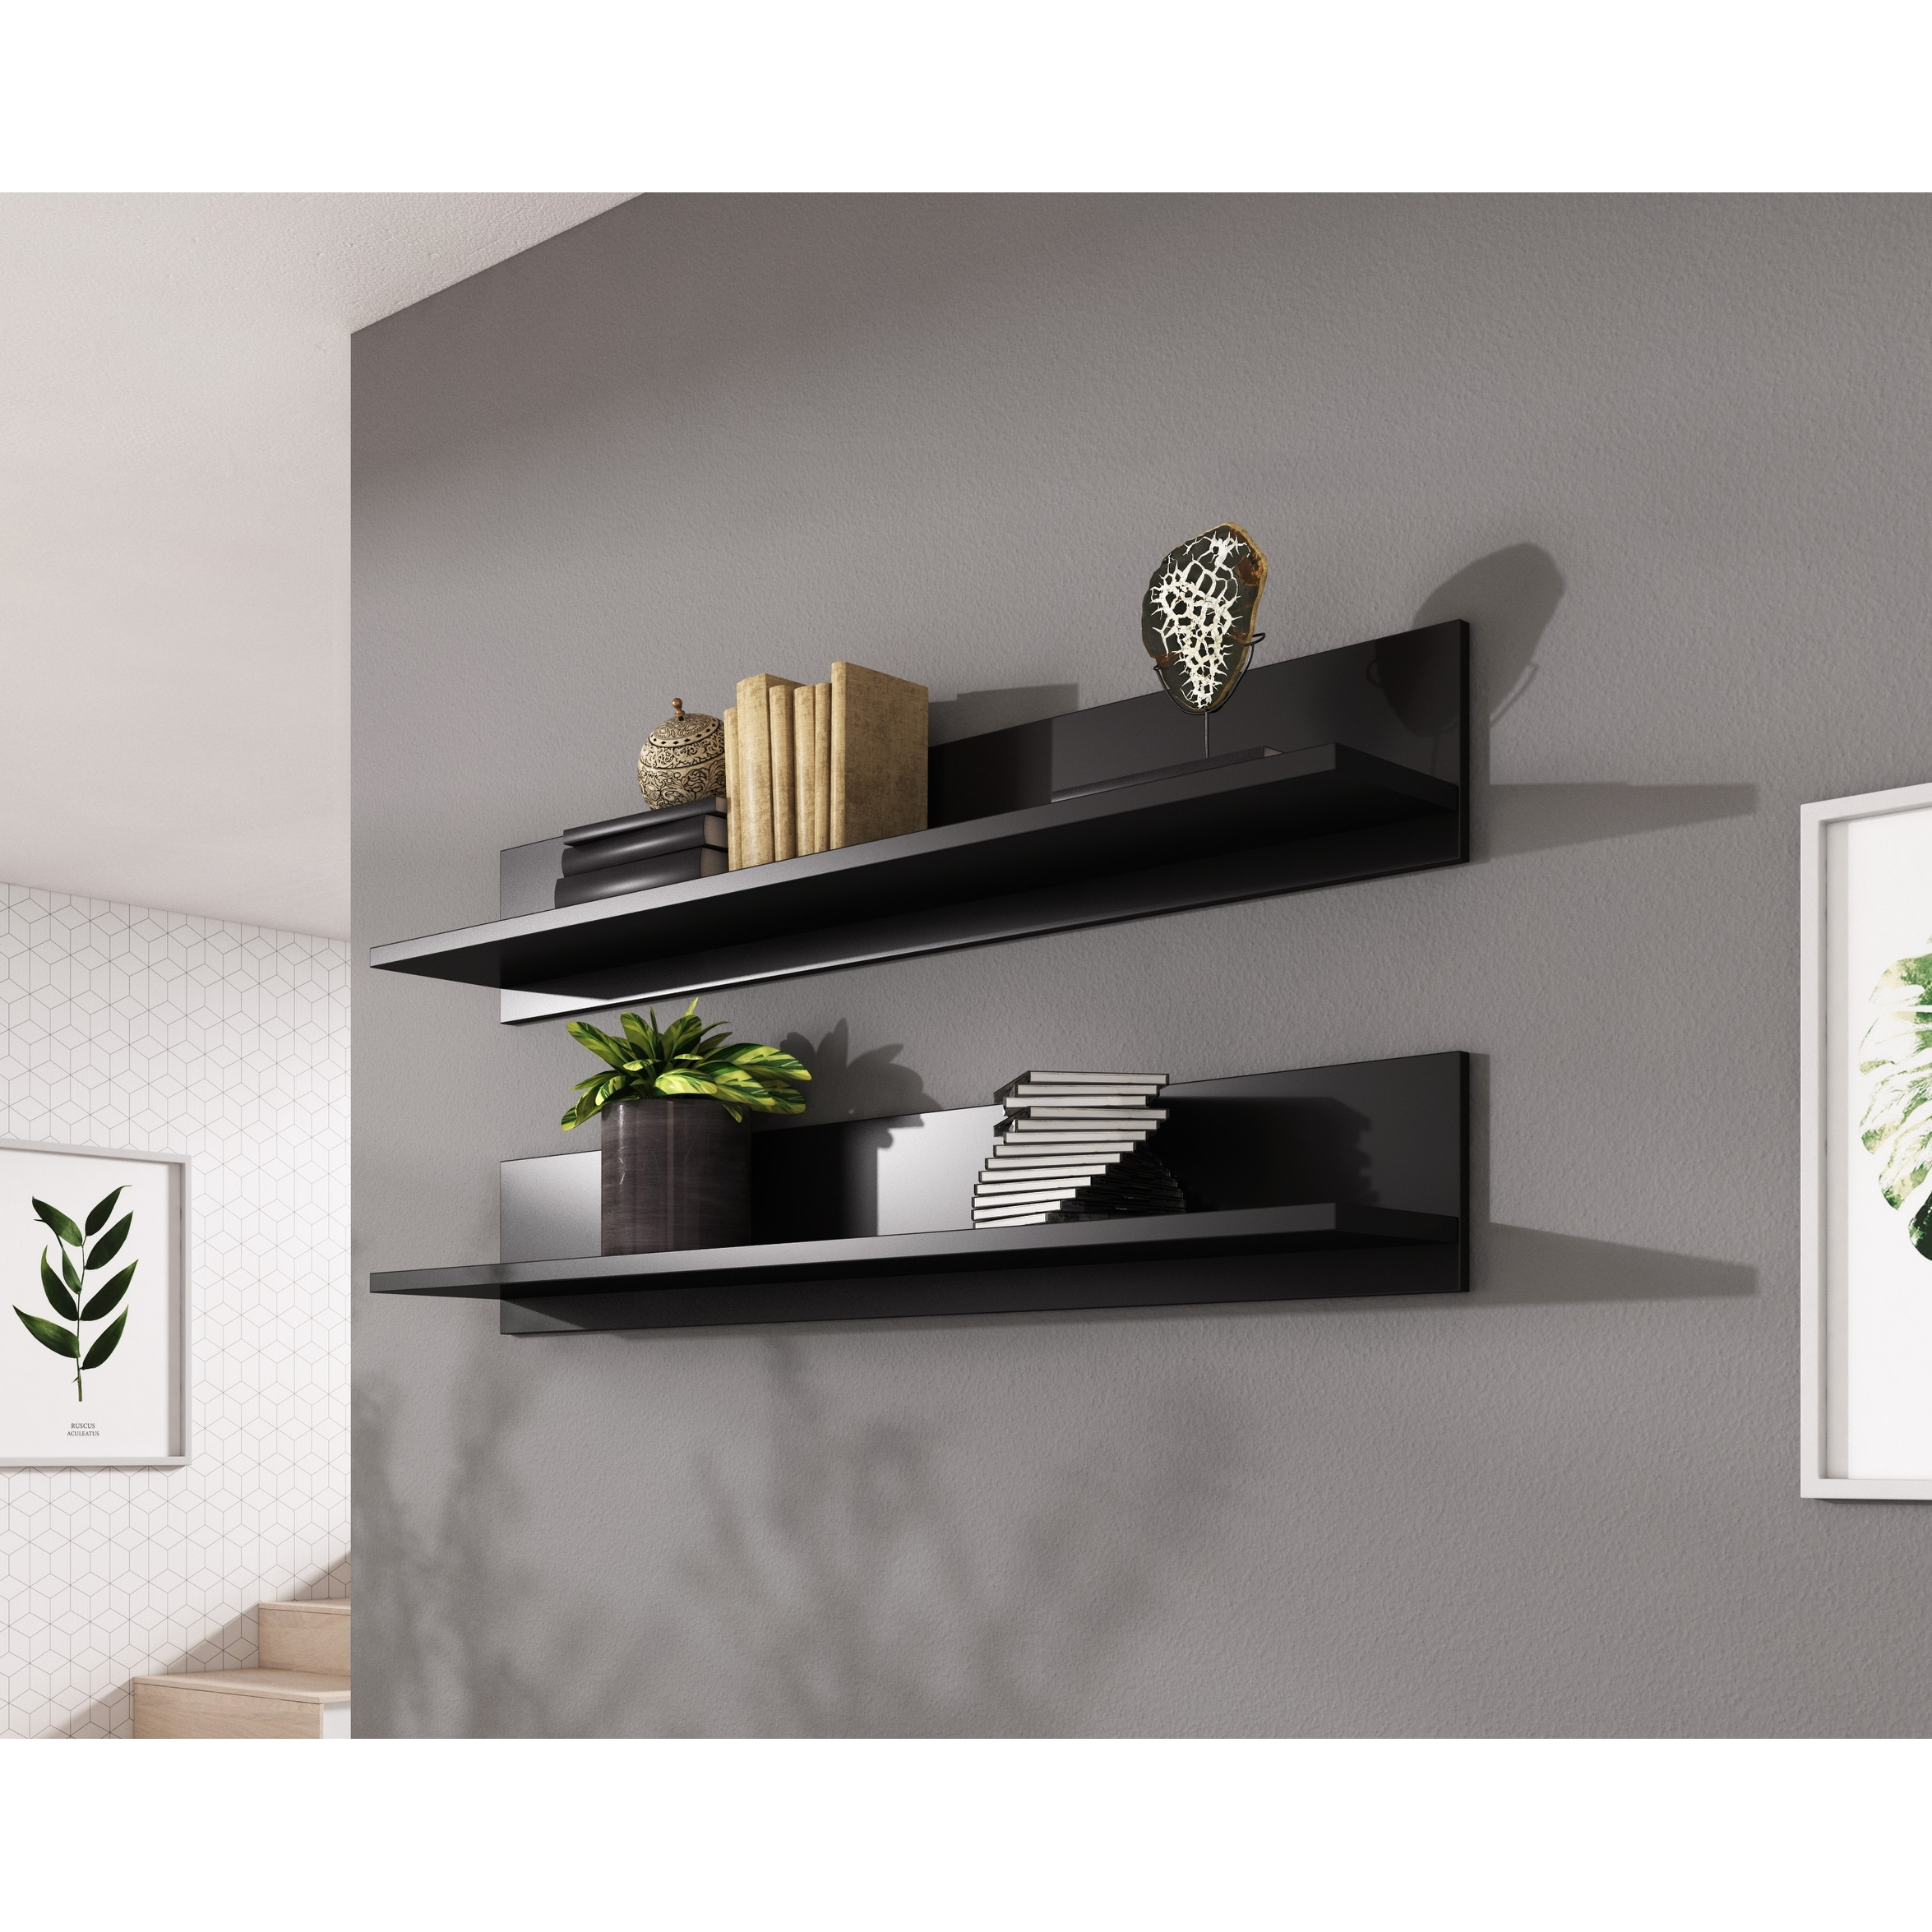 Soho S5 Modular Modern Wall Mounted Floating 2 Piece Shelf Set On Sale Overstock 29139346